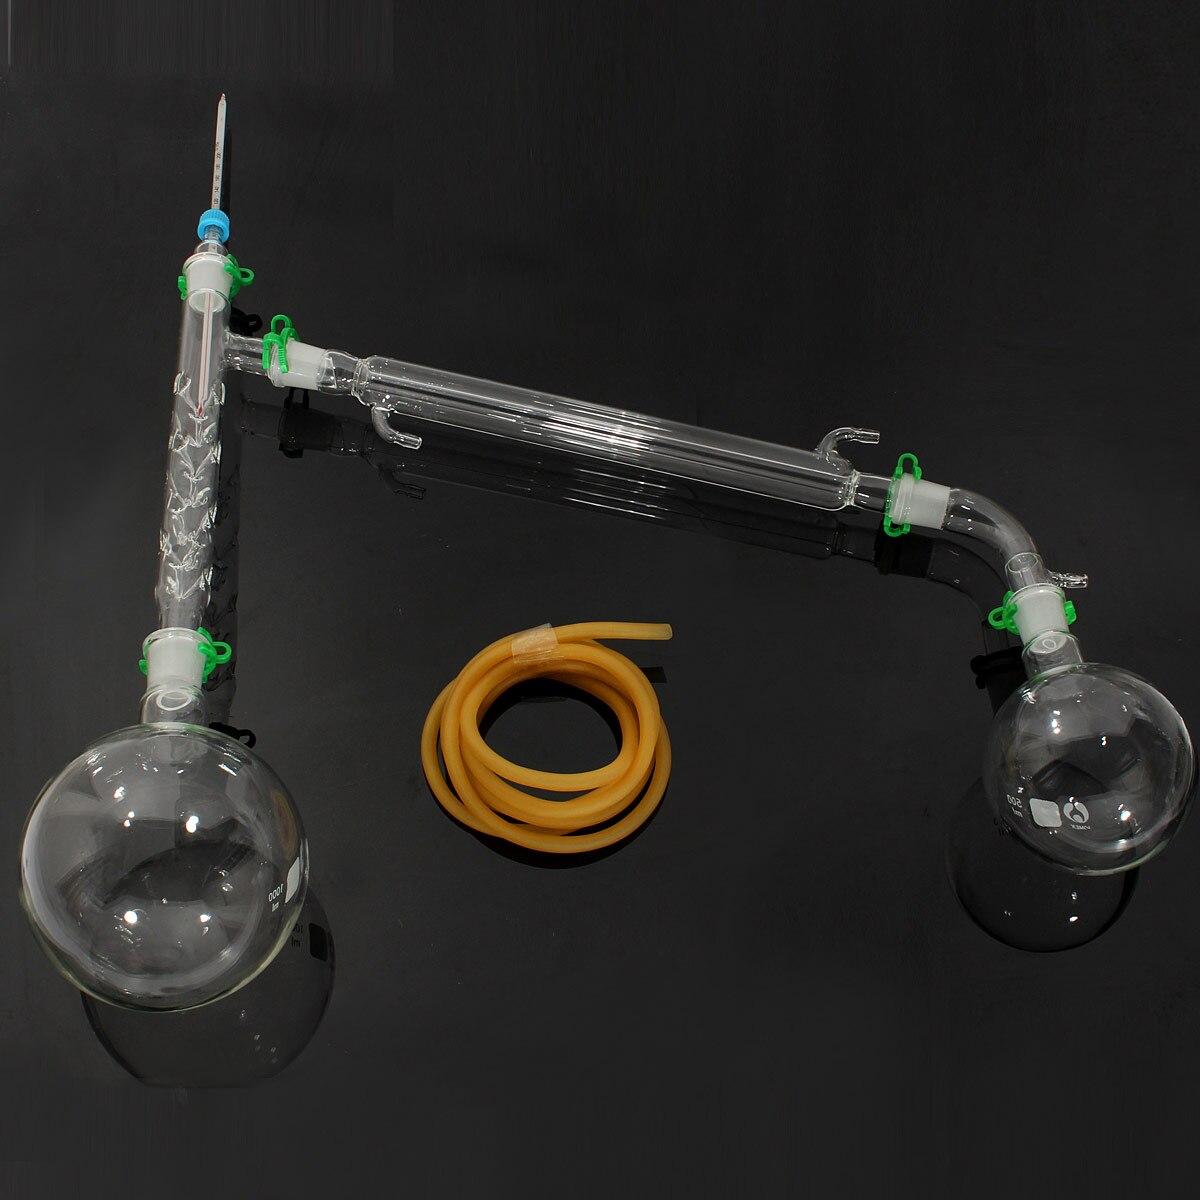 1000ml Distillation Apparatus Laboratory Chemistry Glassware Kit Set Chemistry Lab Glass Distilling Distillation Apparatus 24/29